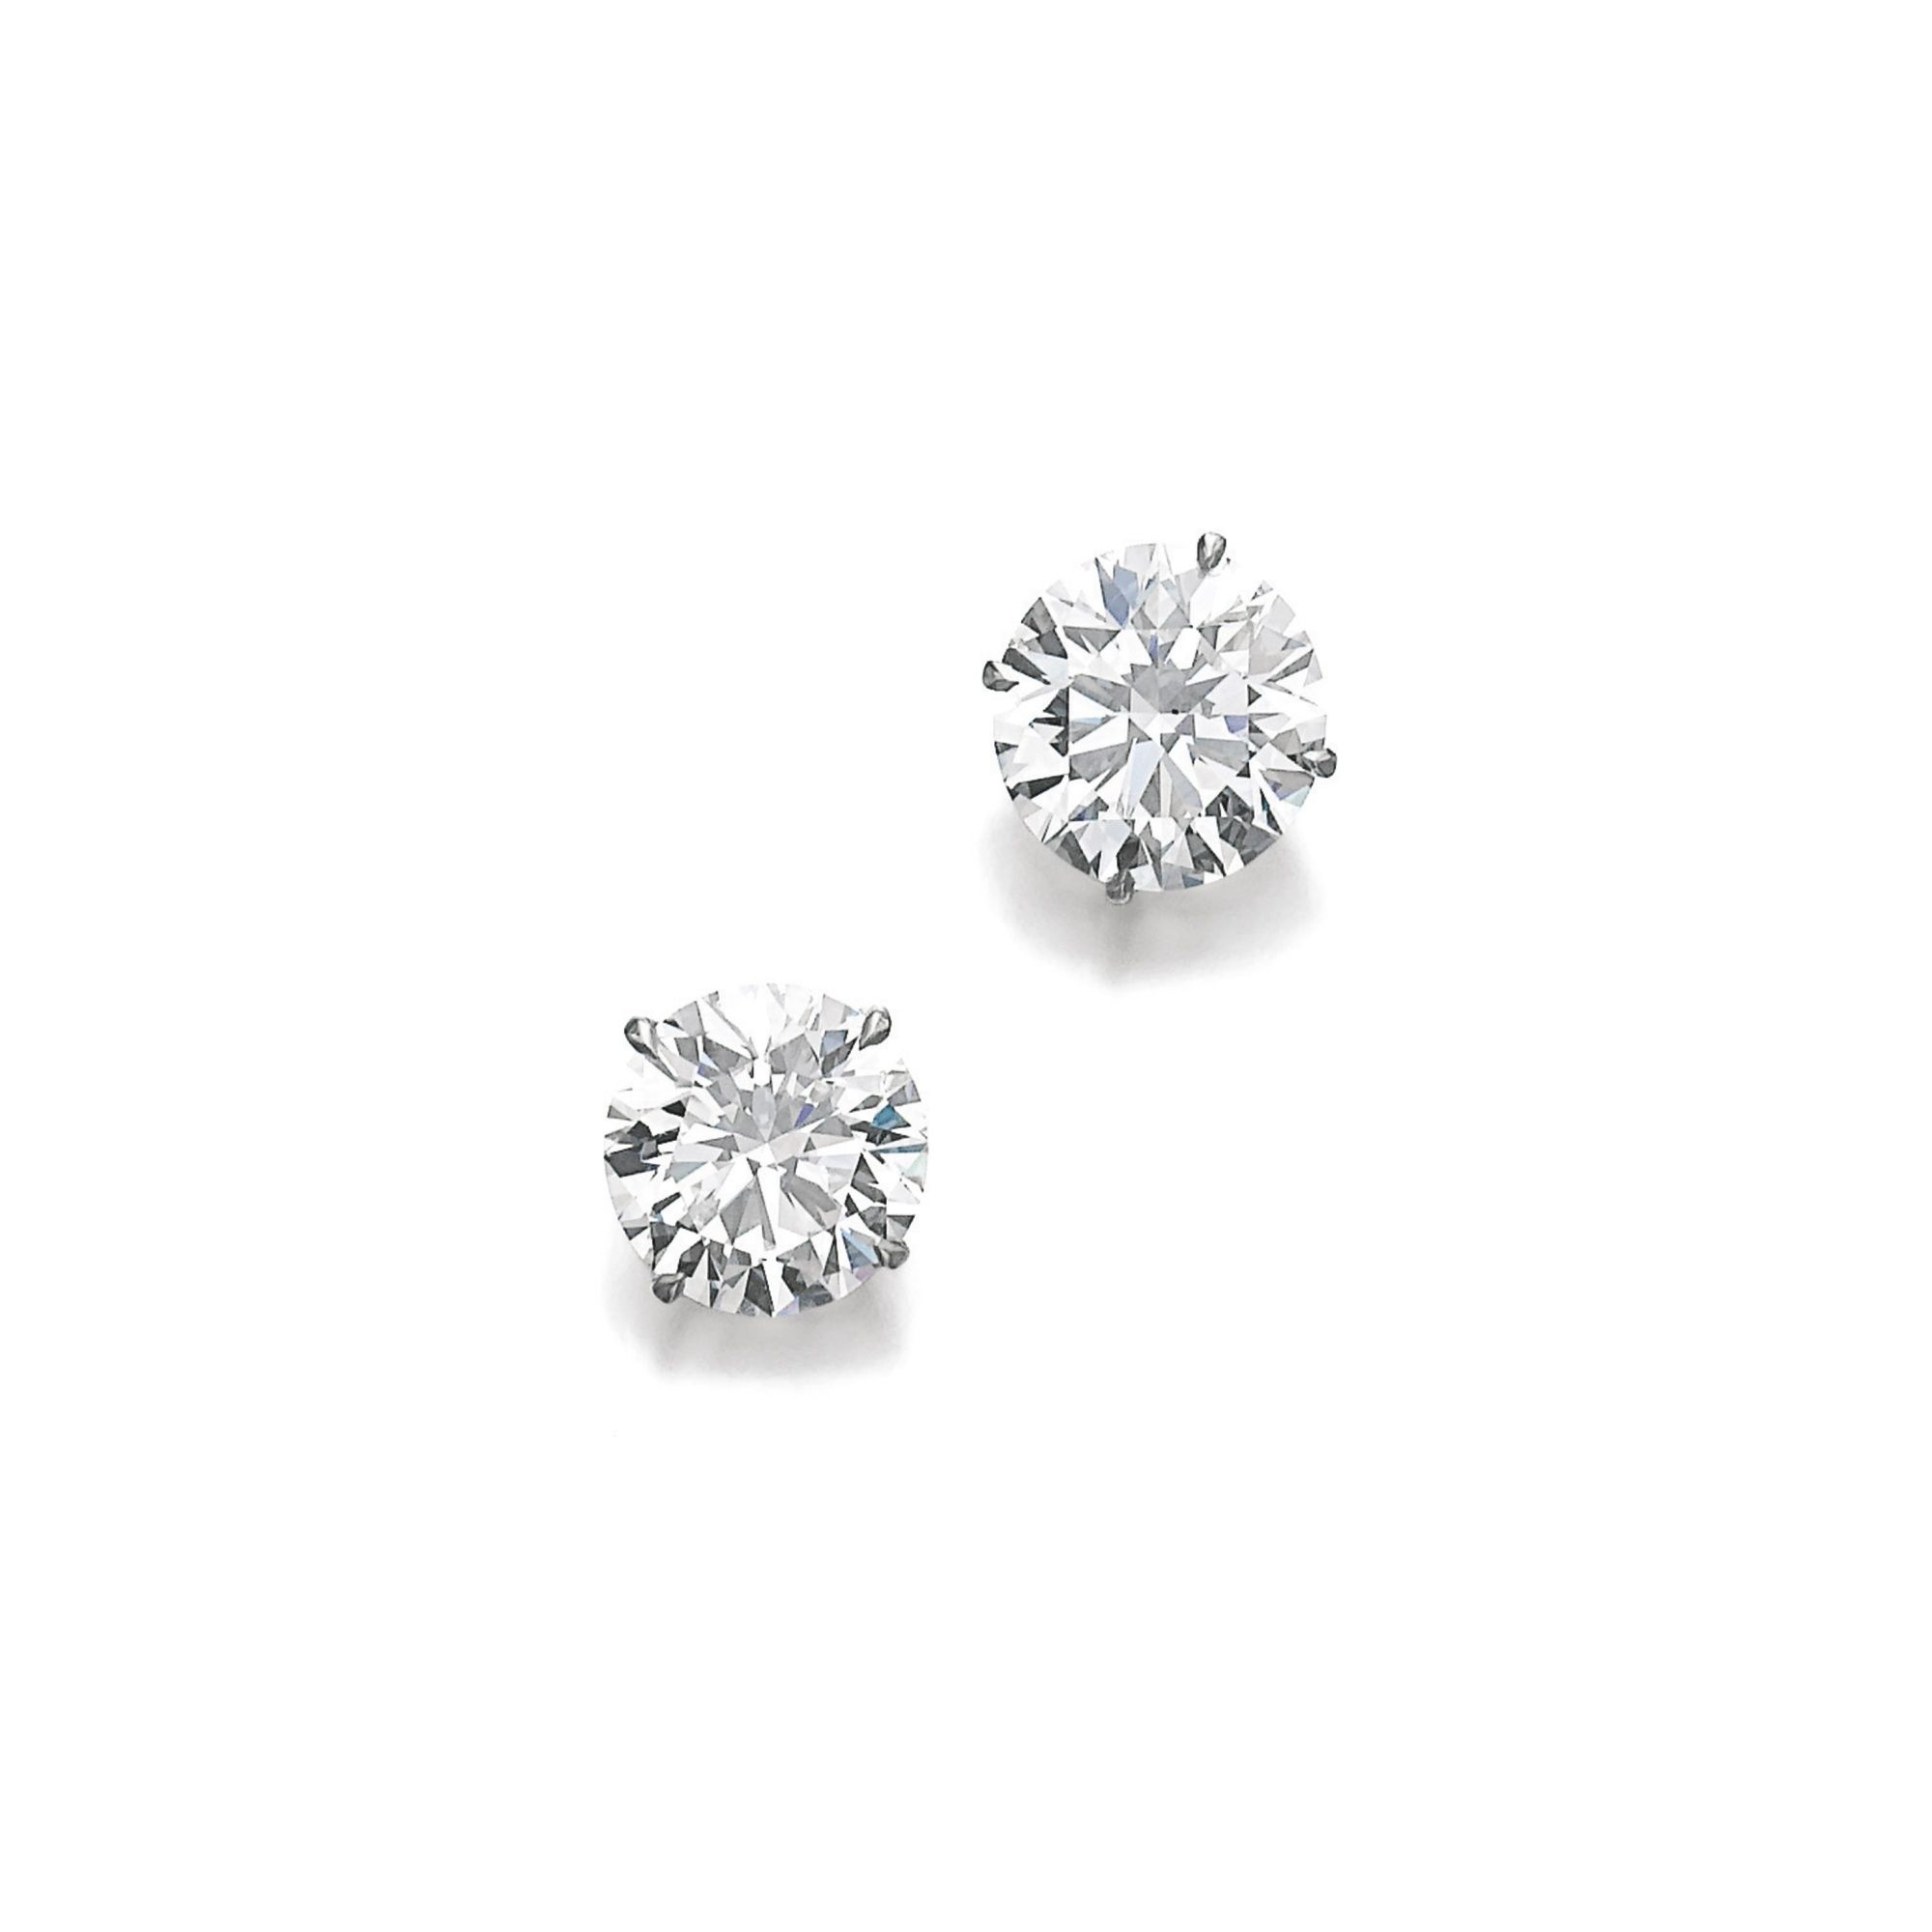 Pair of fine diamond ear studs